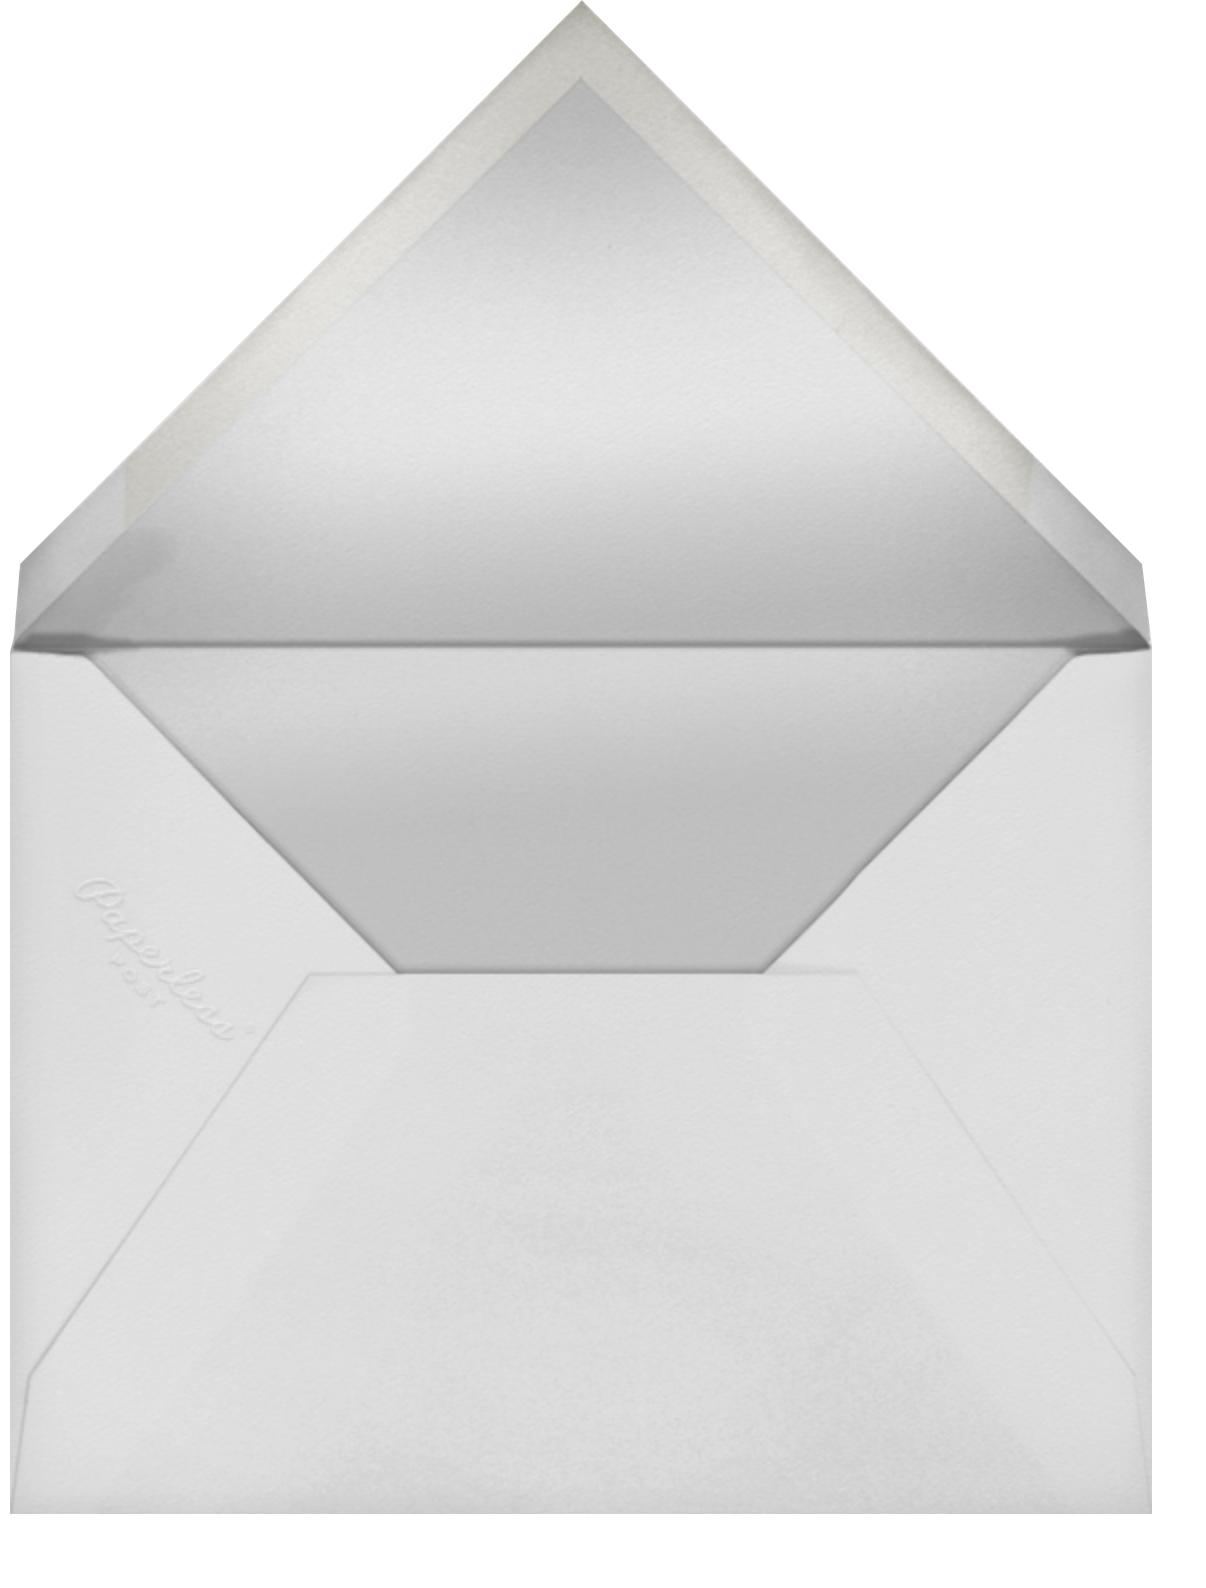 Chevron (Orange) - Paperless Post - Envelope